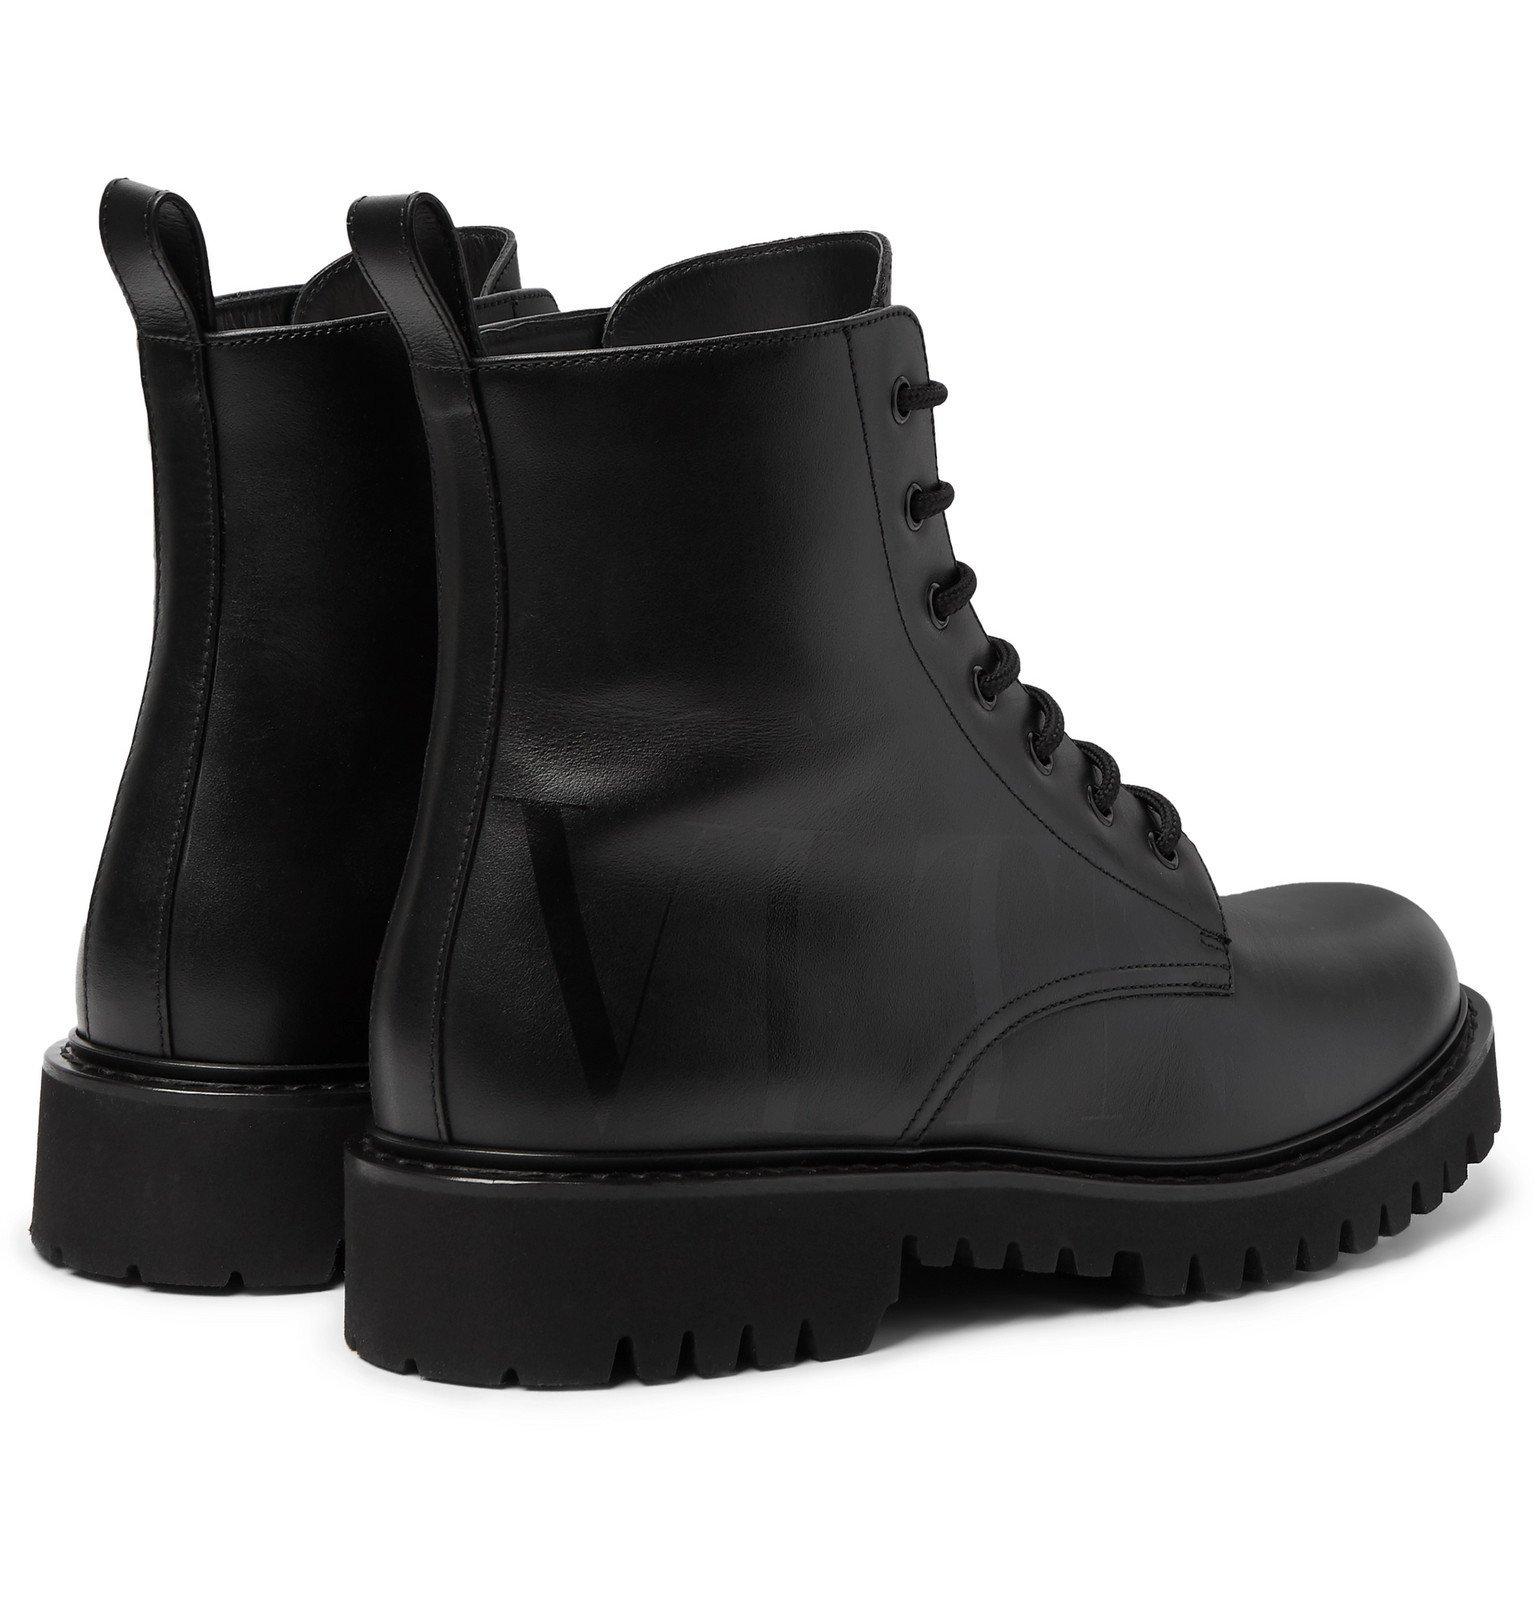 Valentino - Valentino Garavani Logo-Print Leather Boots - Black